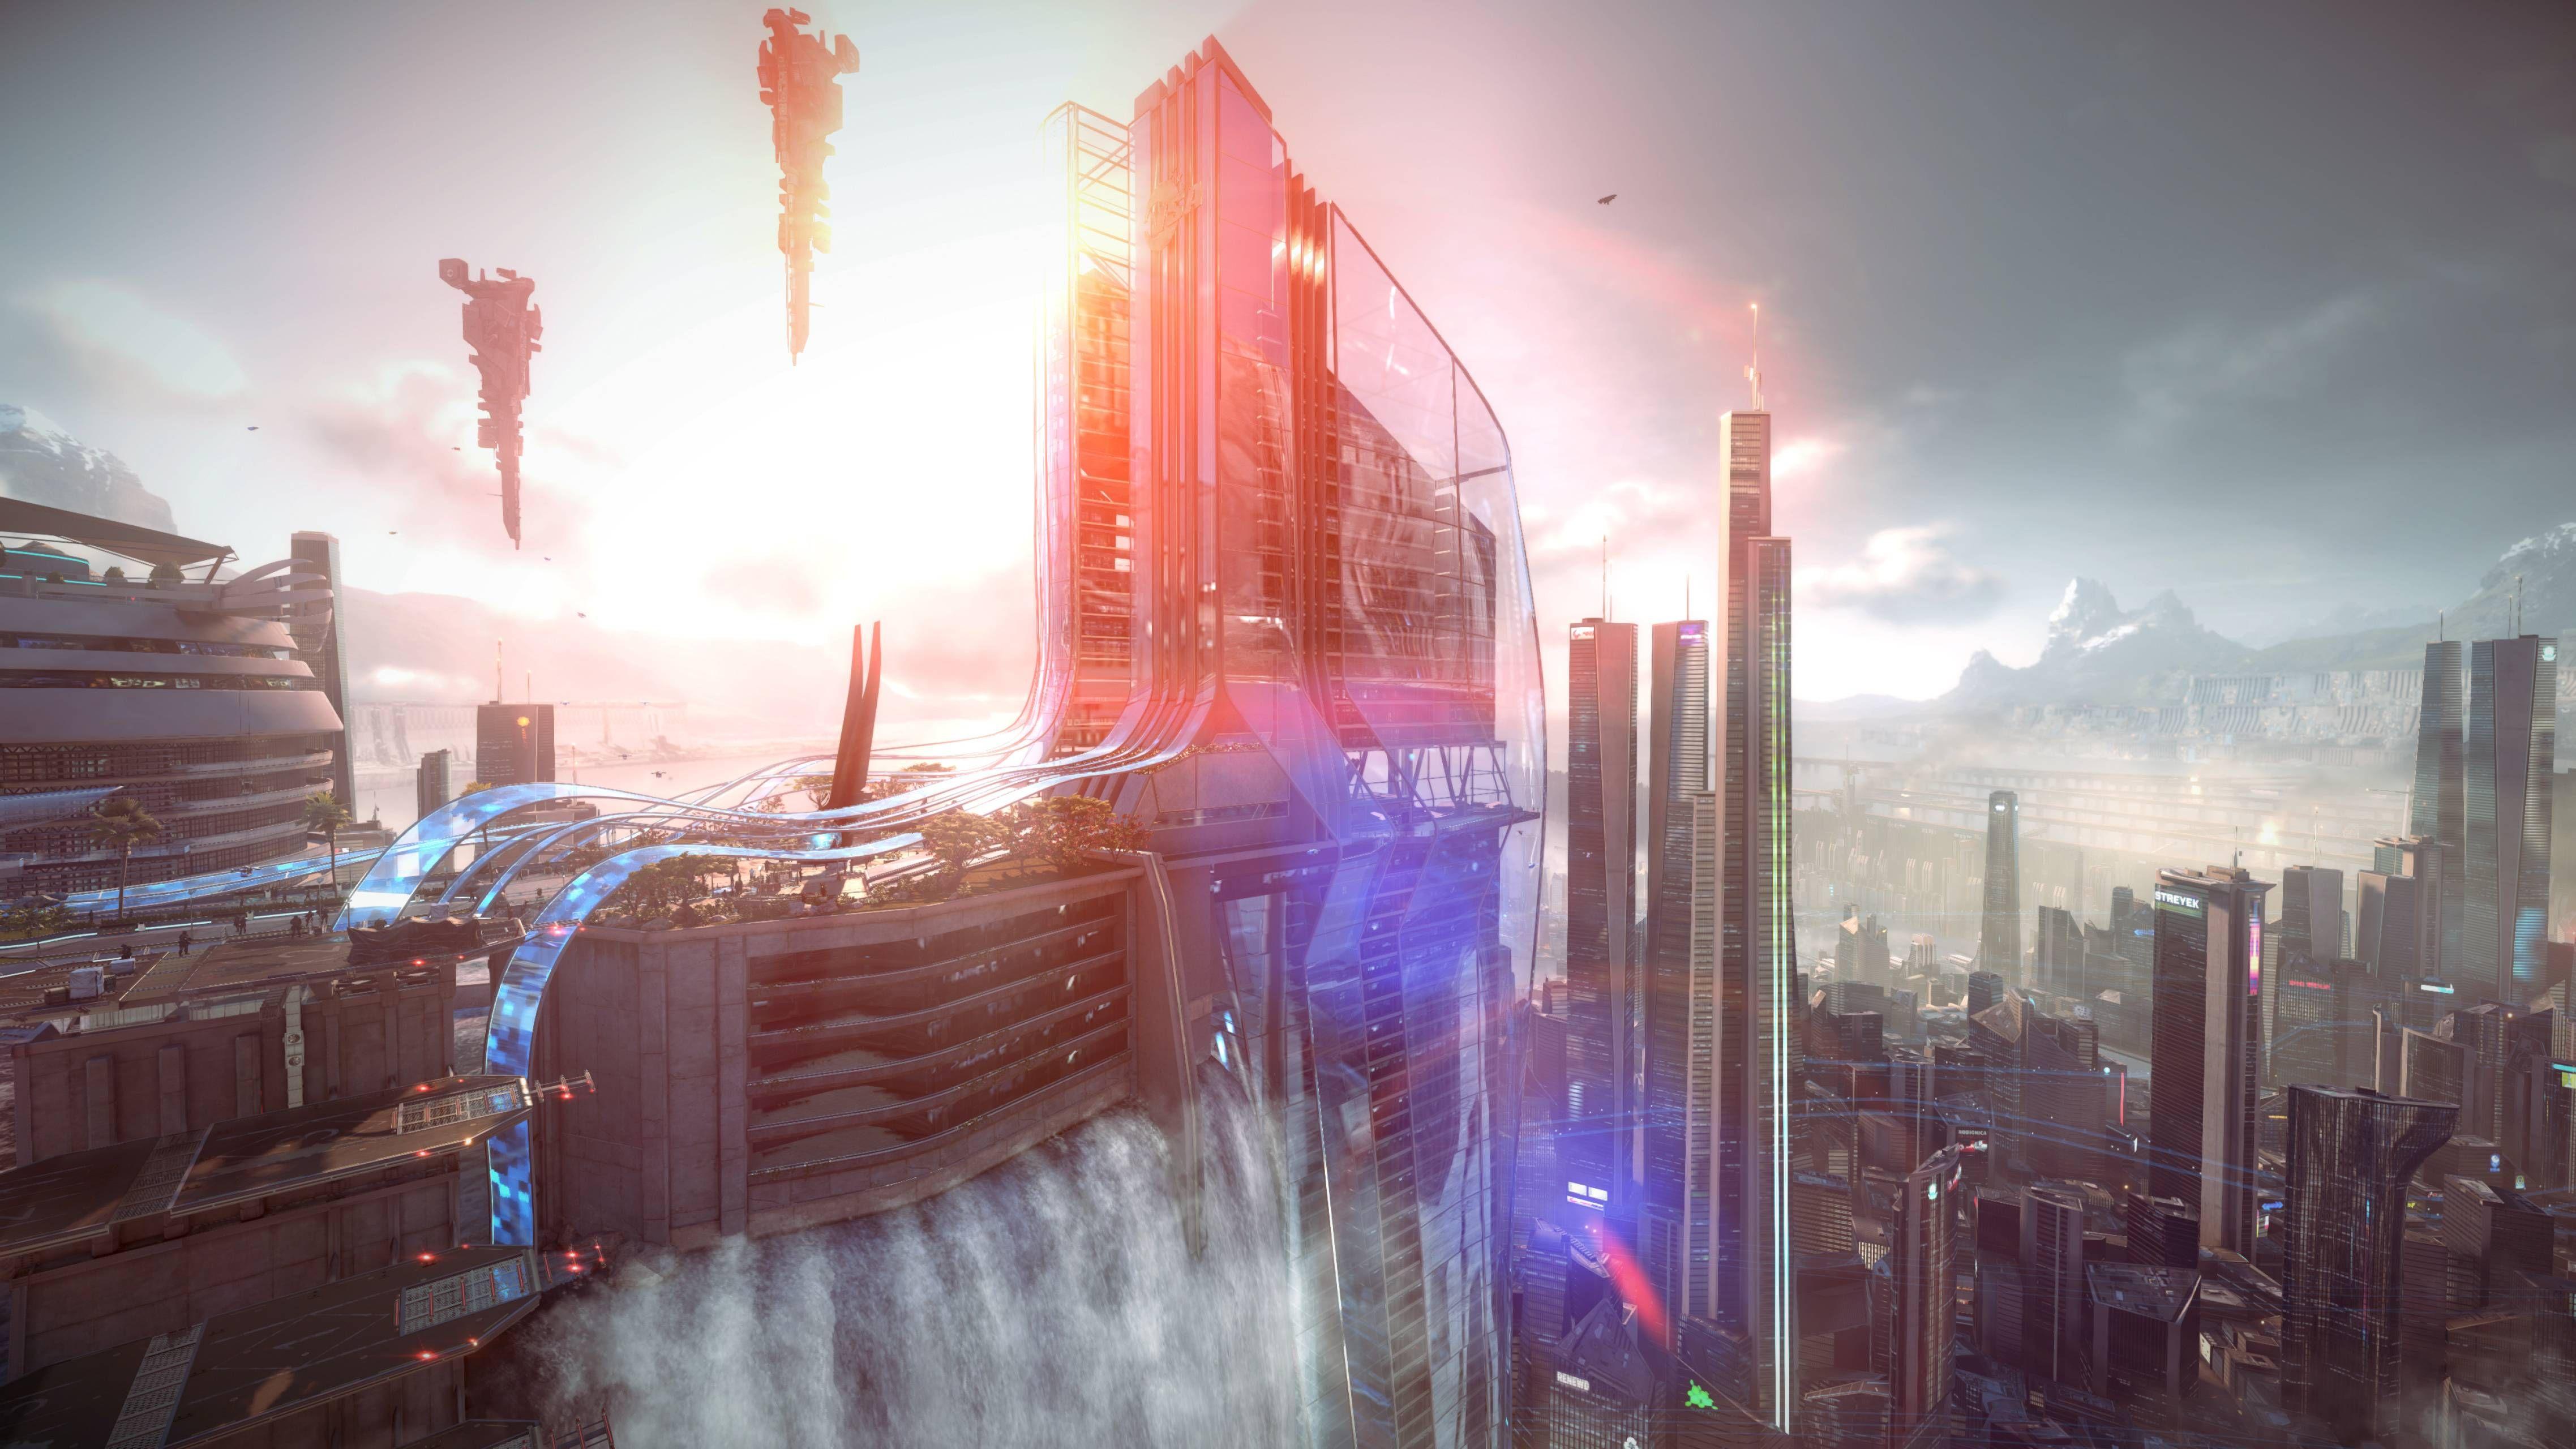 Cyber Punk Art Dumped  Cityscapes  Futuristic City, Fall -6280